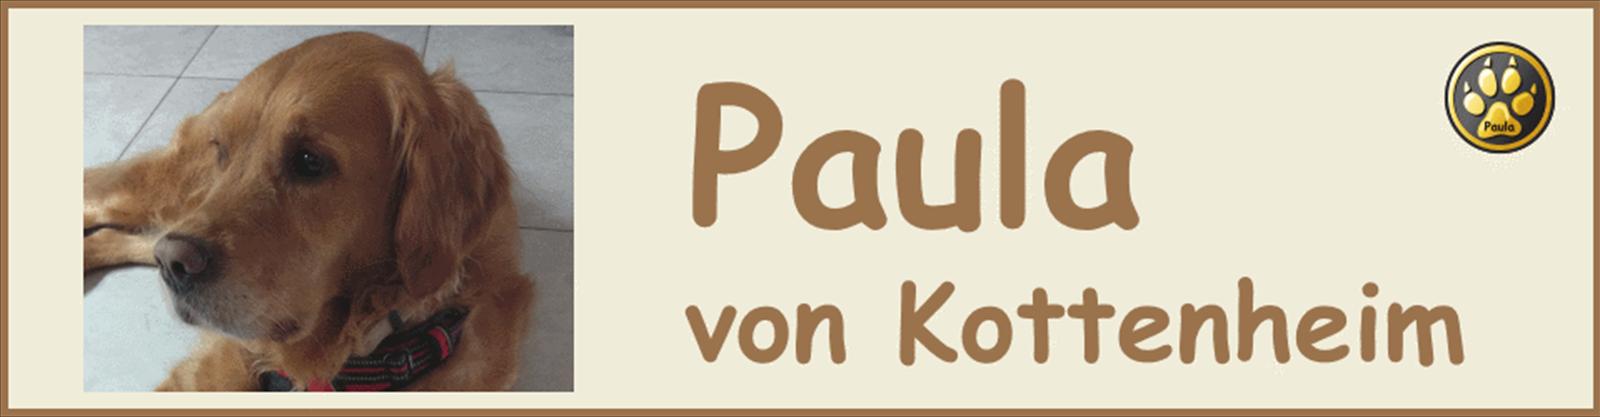 Paula-Banner-15